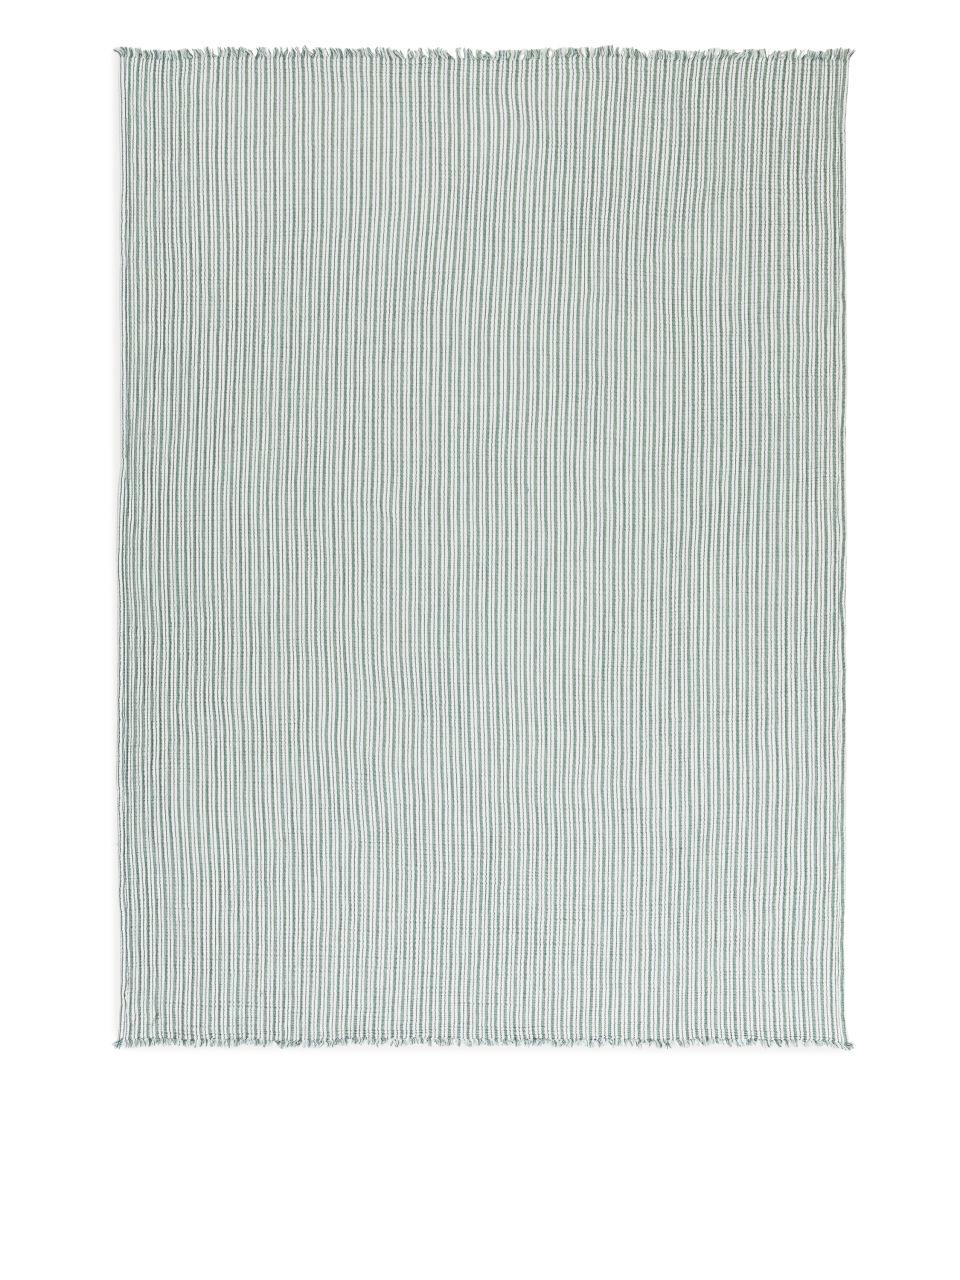 Woven Cotton Blanket - Green